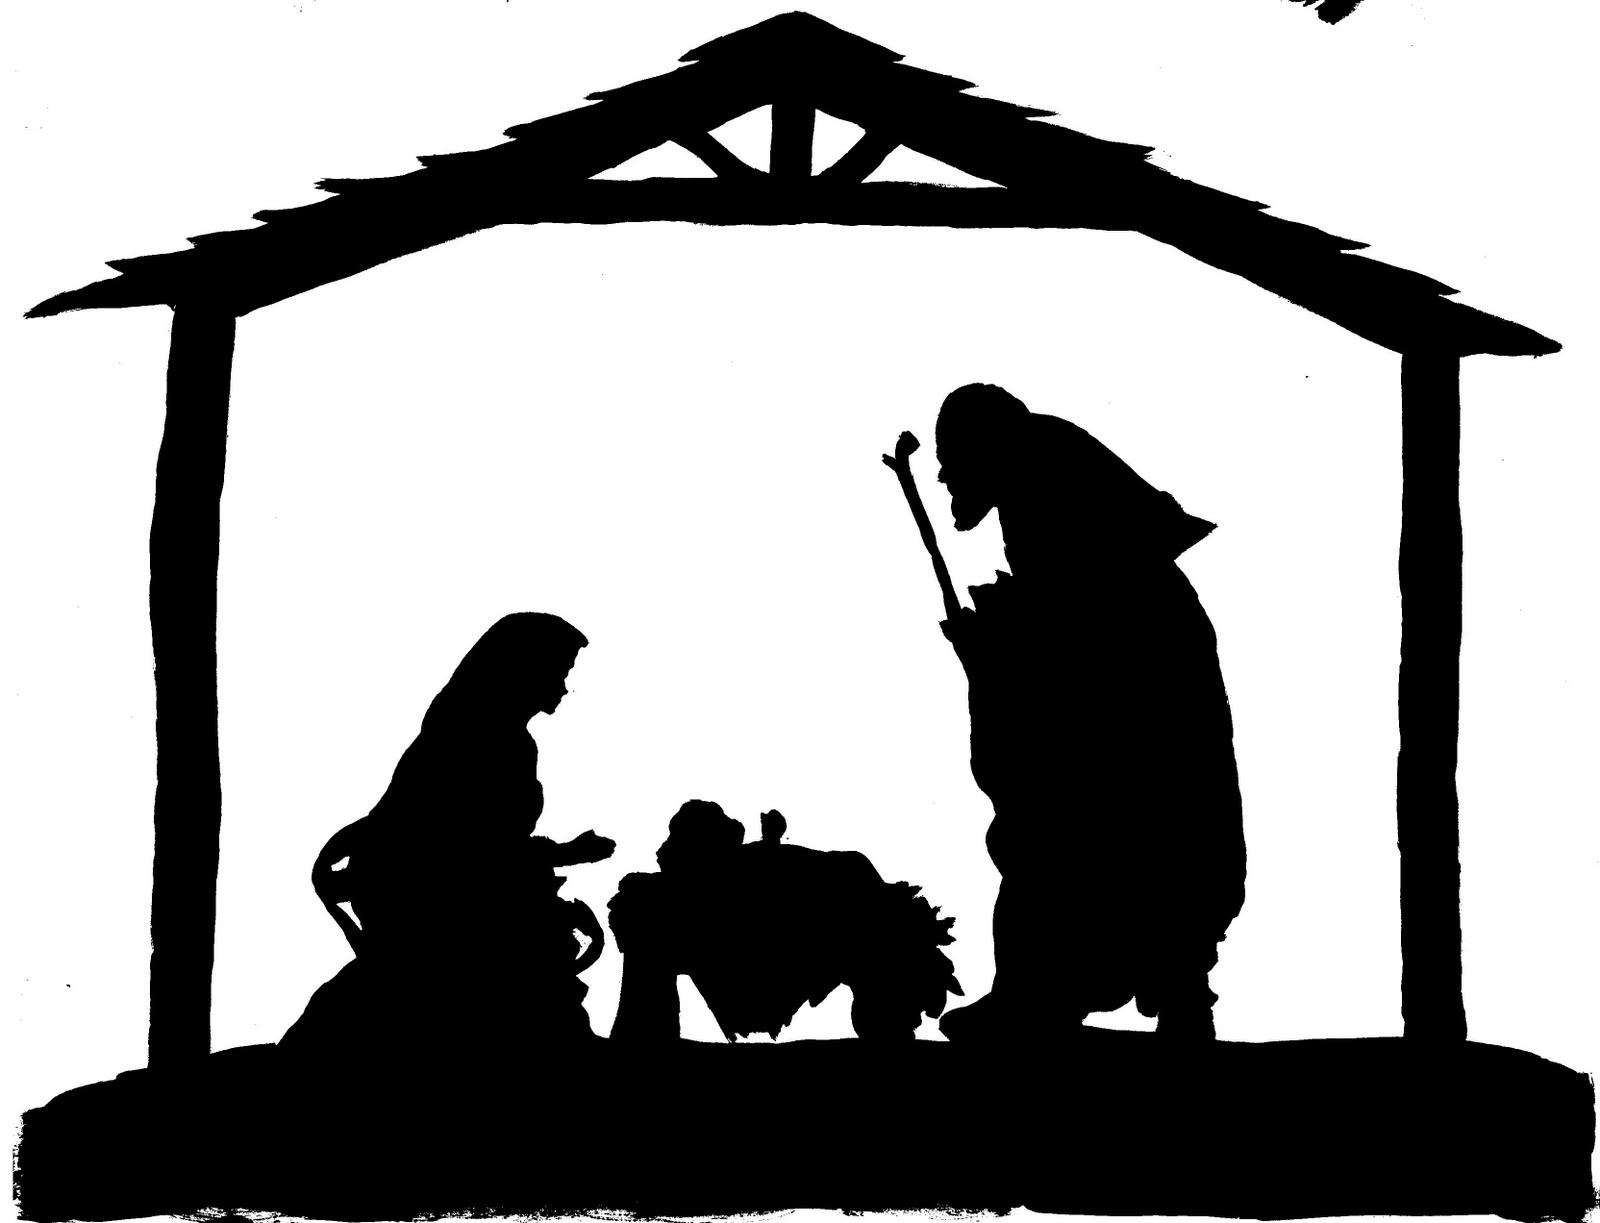 Nativity Silhouette Patterns - Clipart L-Nativity Silhouette Patterns - Clipart library-17